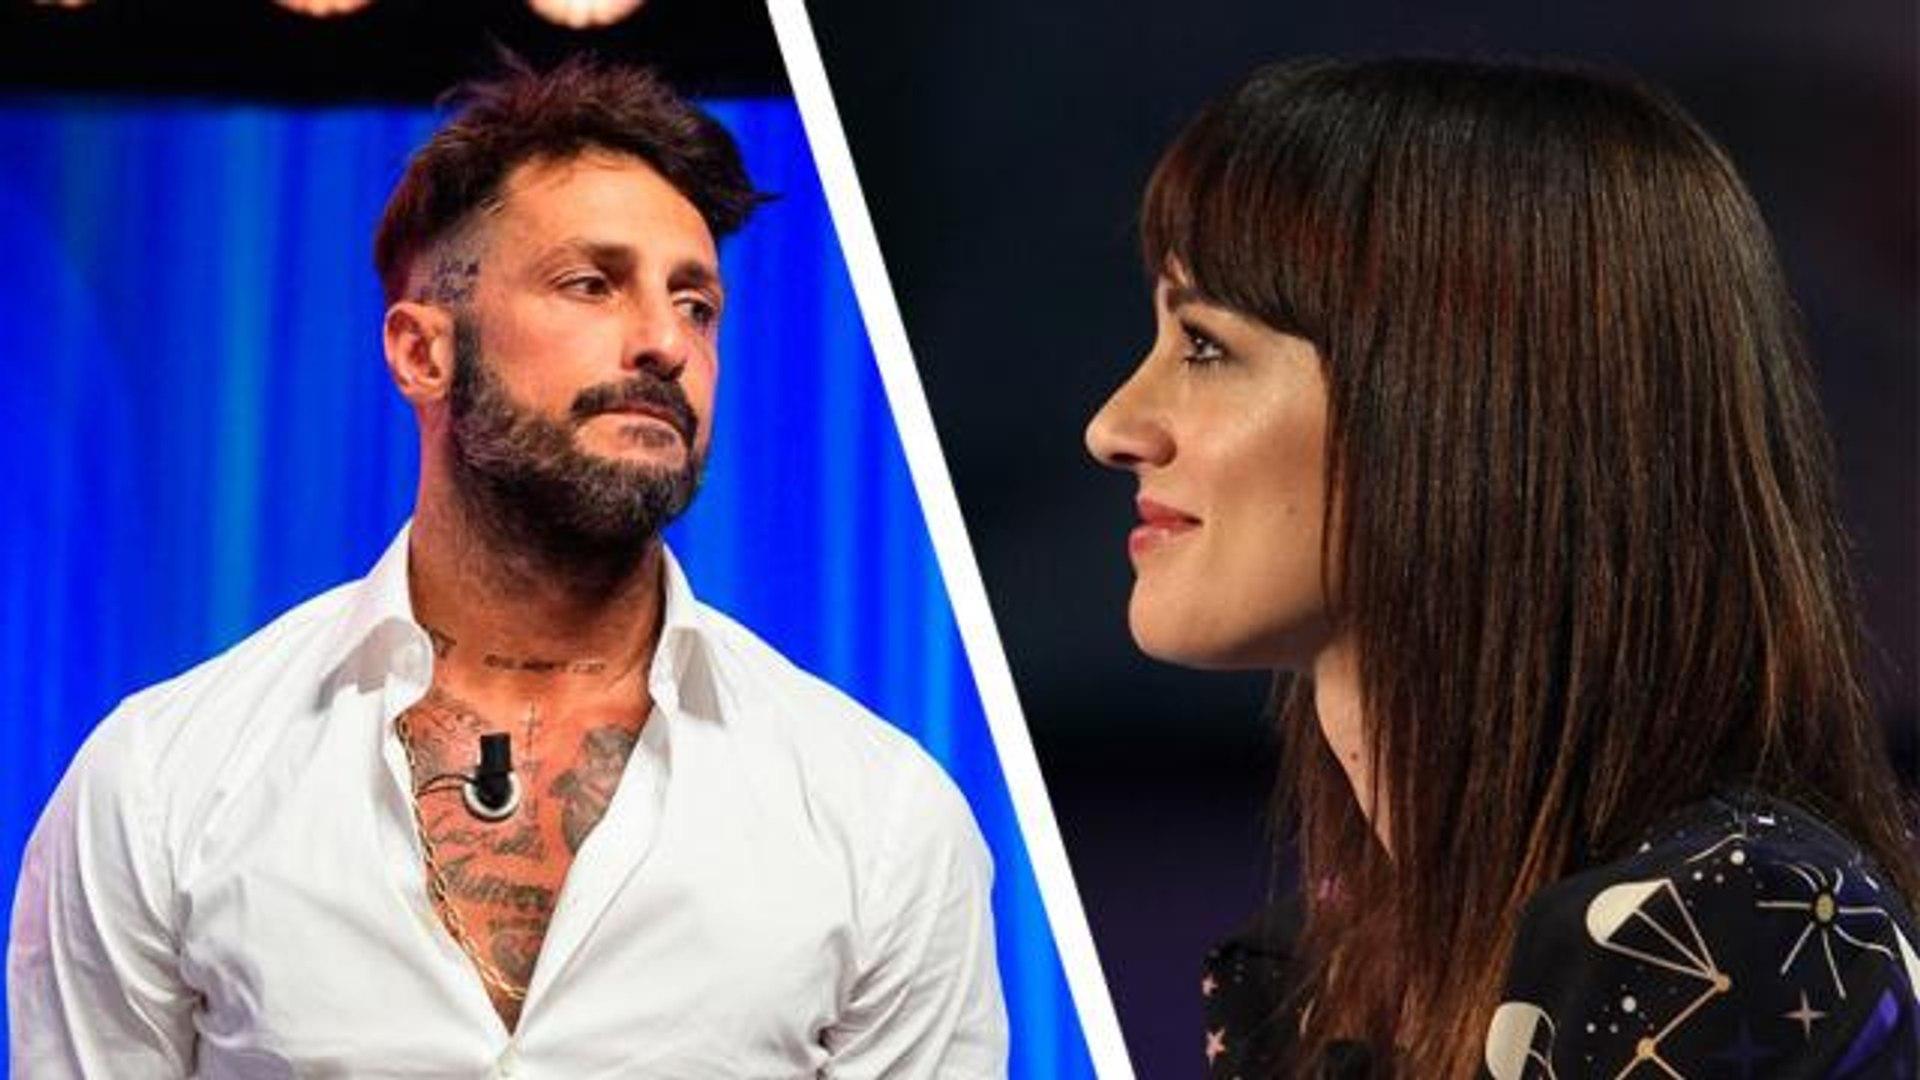 'Macchè innamorata, arriva Fabrizio e mi rovina?', Asia Argento a Le Iene su Corona: ha confes